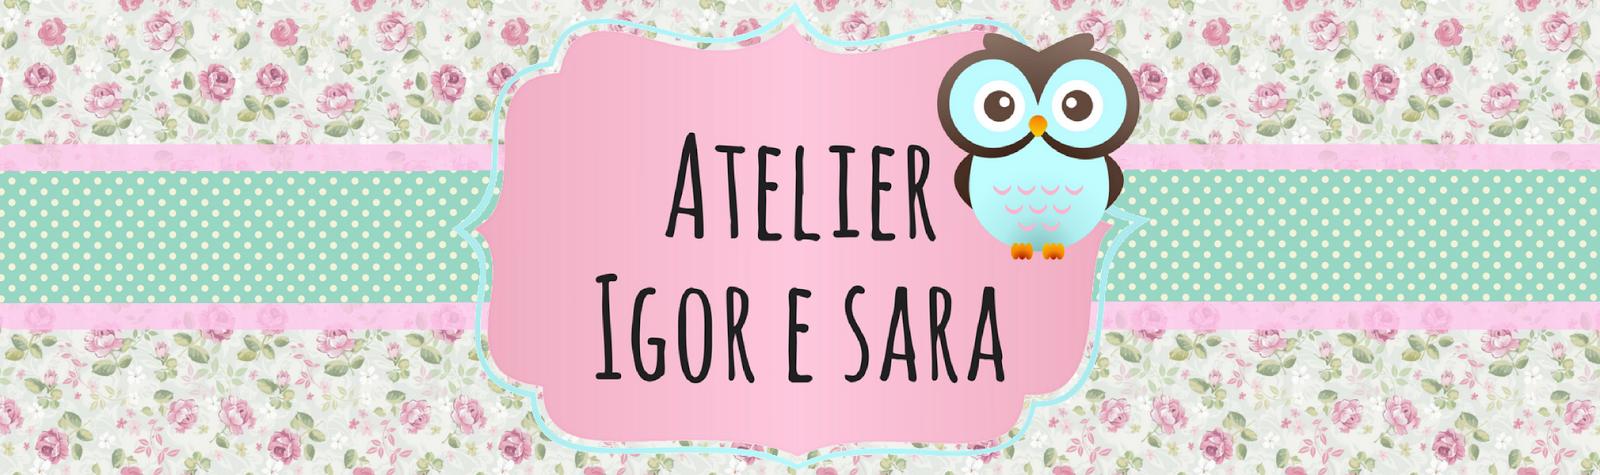 Atelier Igor e Sara